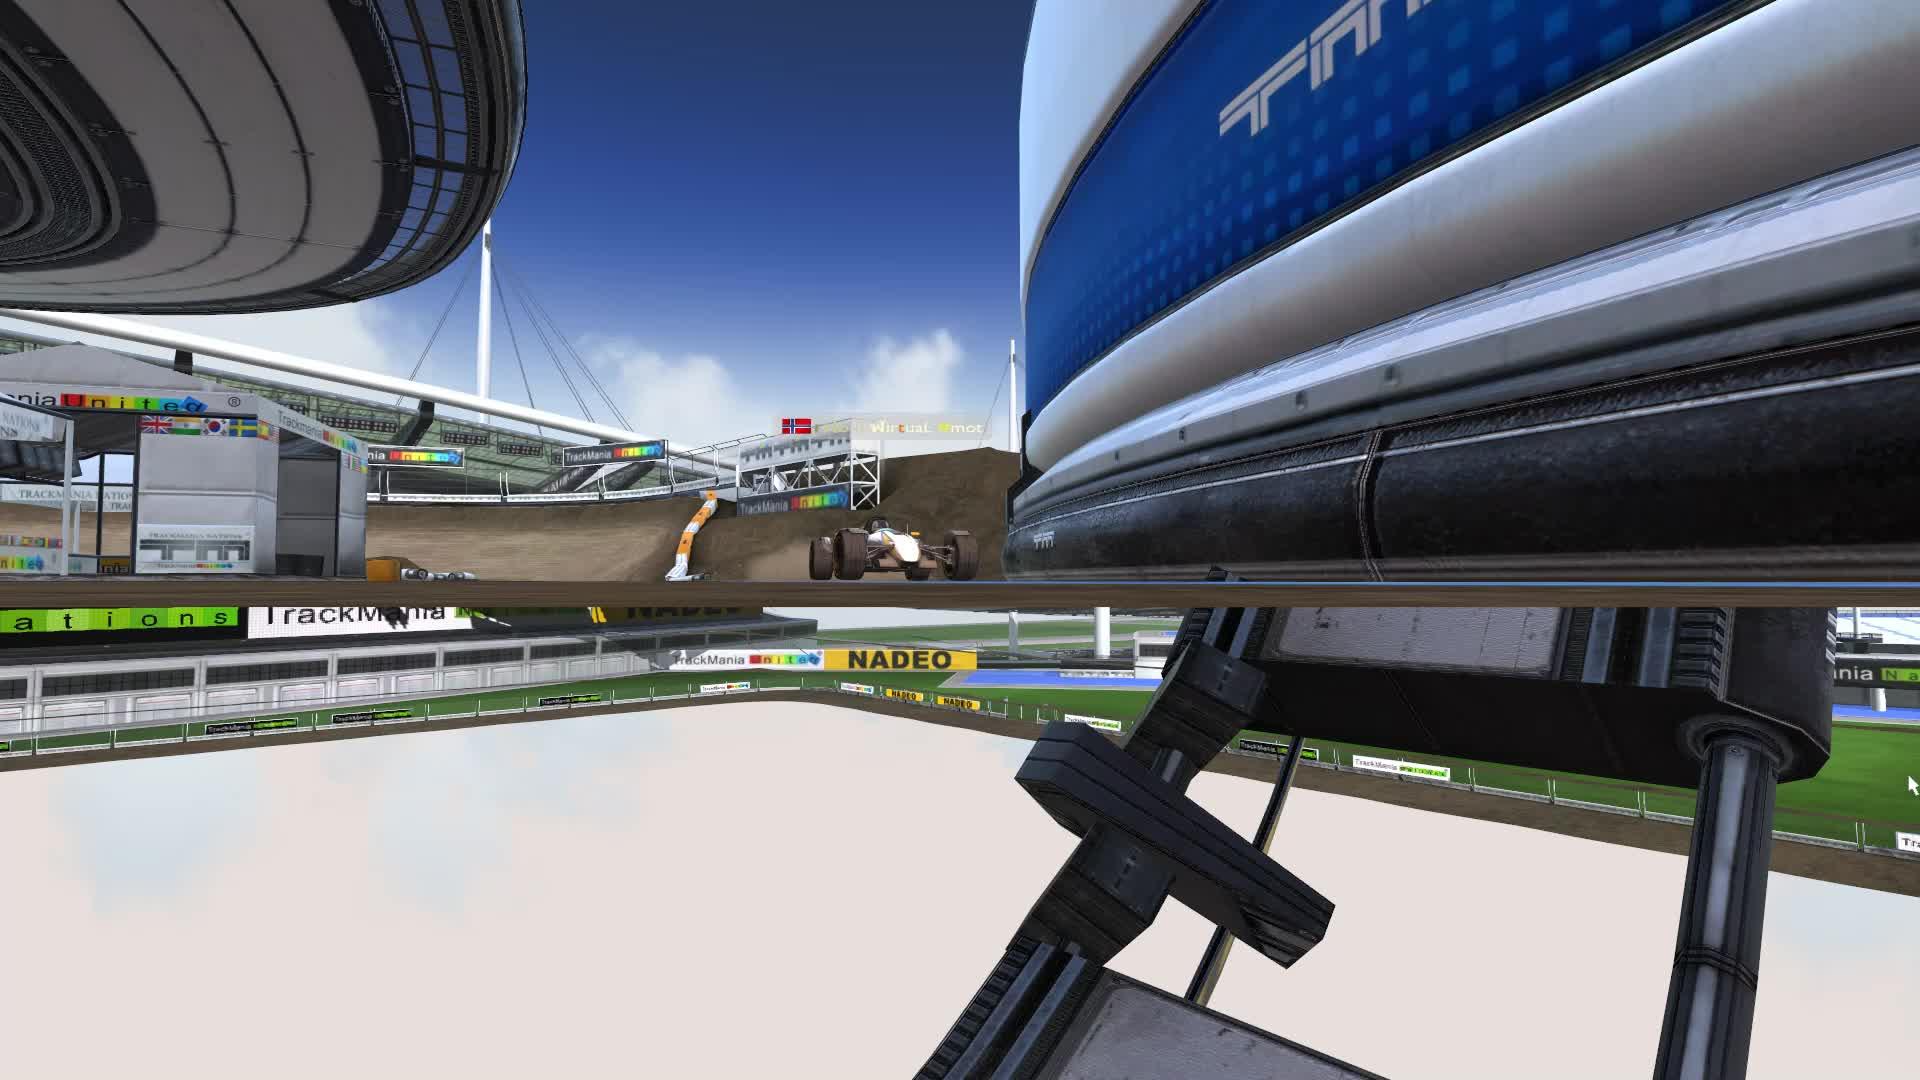 Trackmania  Forever 08.01.2017 - 22.25.34.08 GIFs